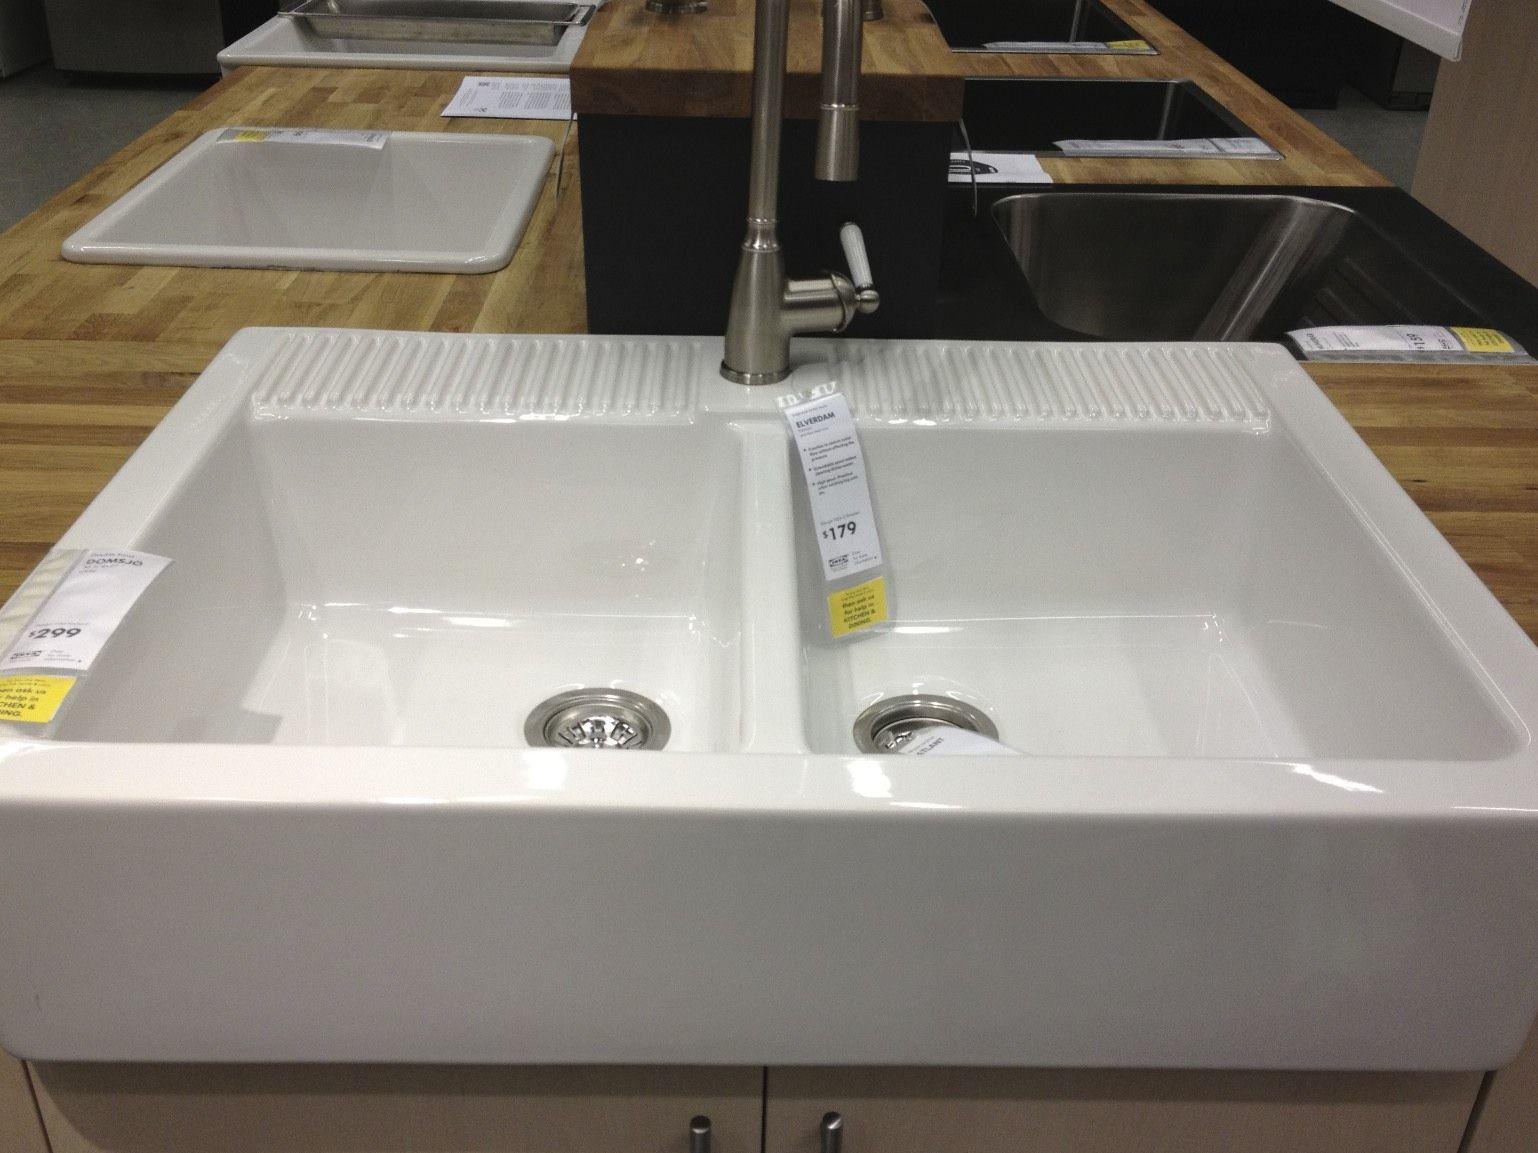 Ikea Kitchen Tour. 86 best images about Ikea Kitchens on Pinterest   Cabinets  Ikea